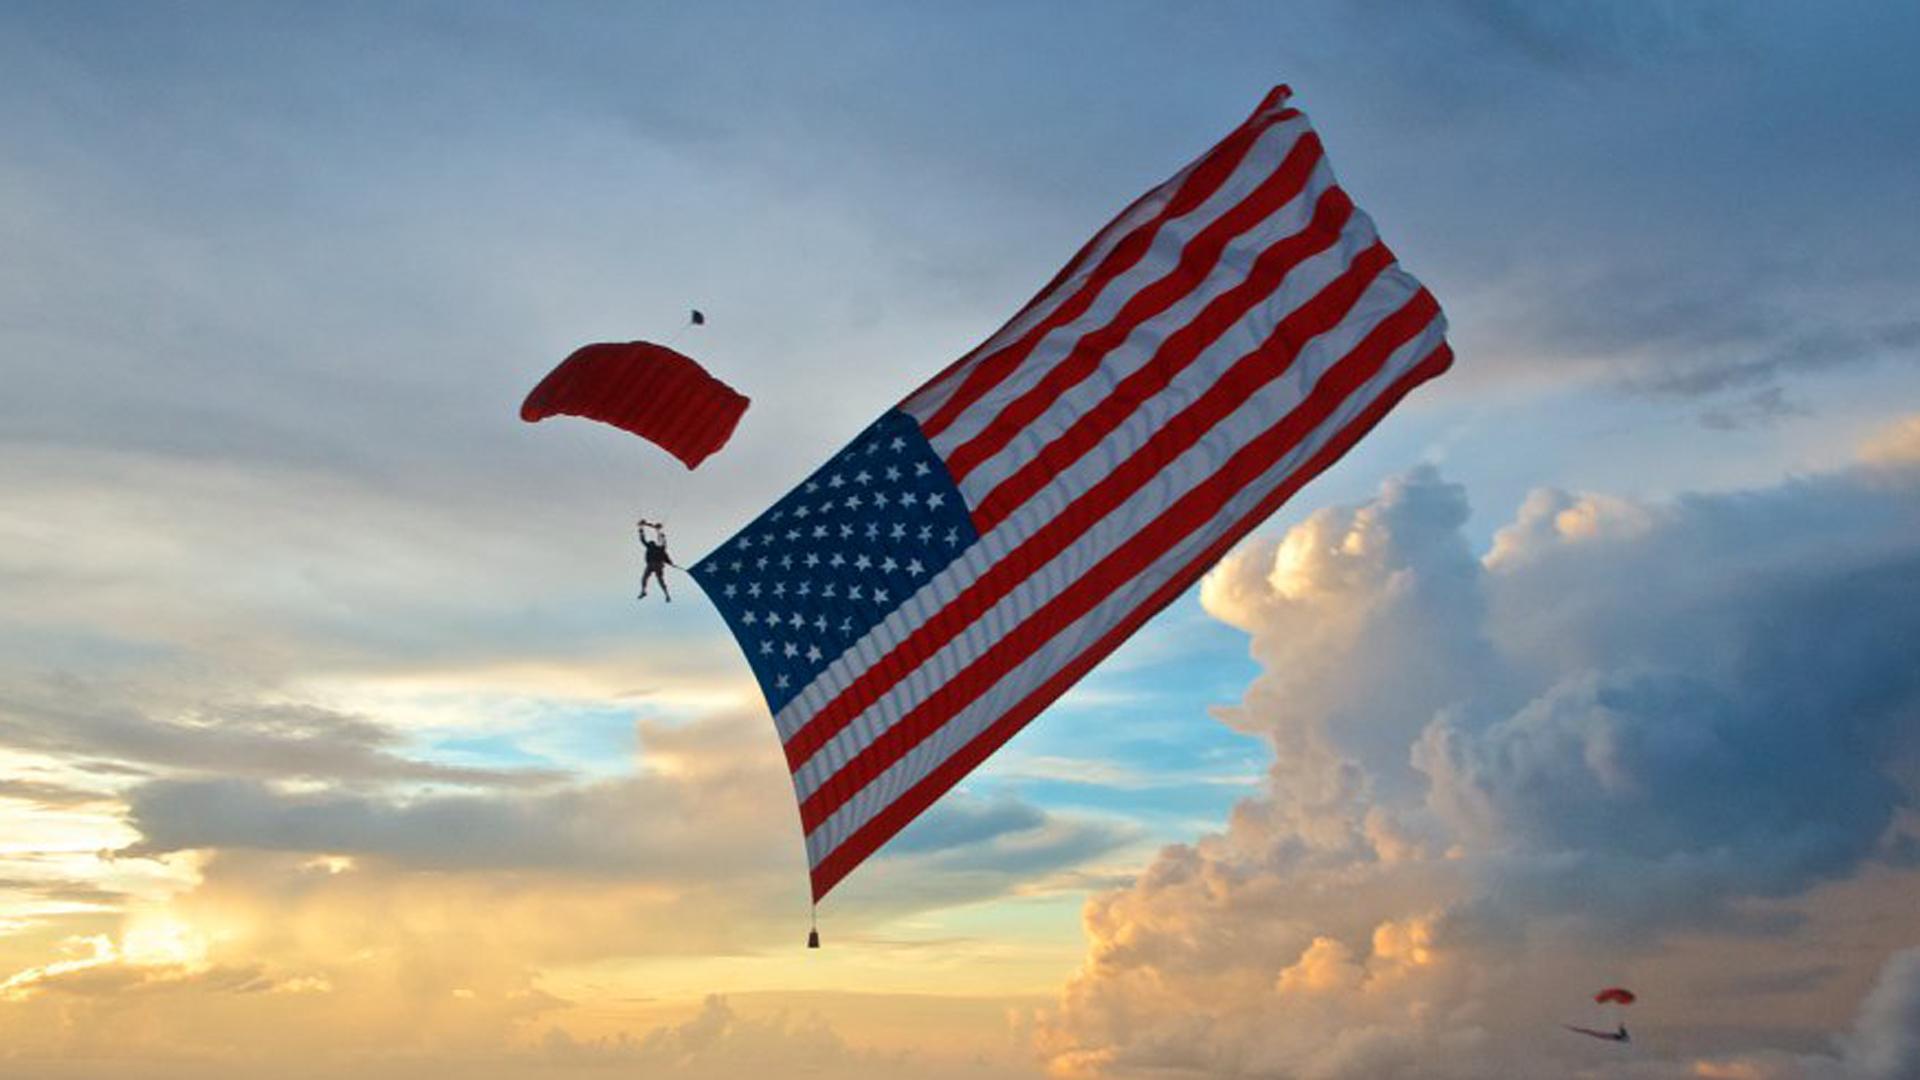 Americana Skydiving Performance photo